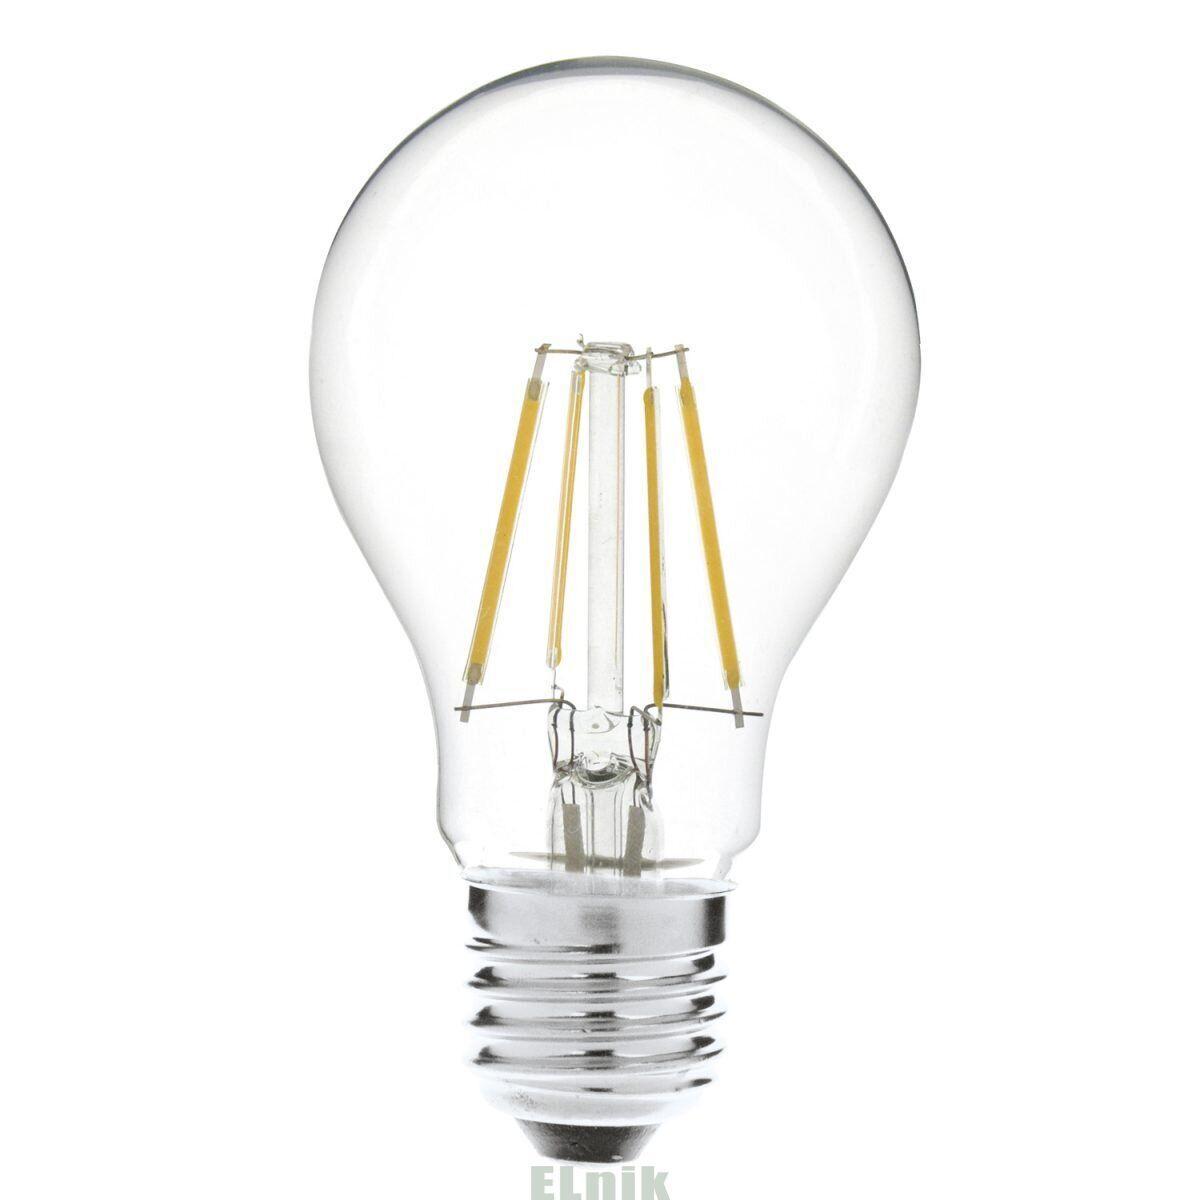 Светодиодная лампа LM-SET 3XE27-LED A60 4W 2700K, Eglo [10042]